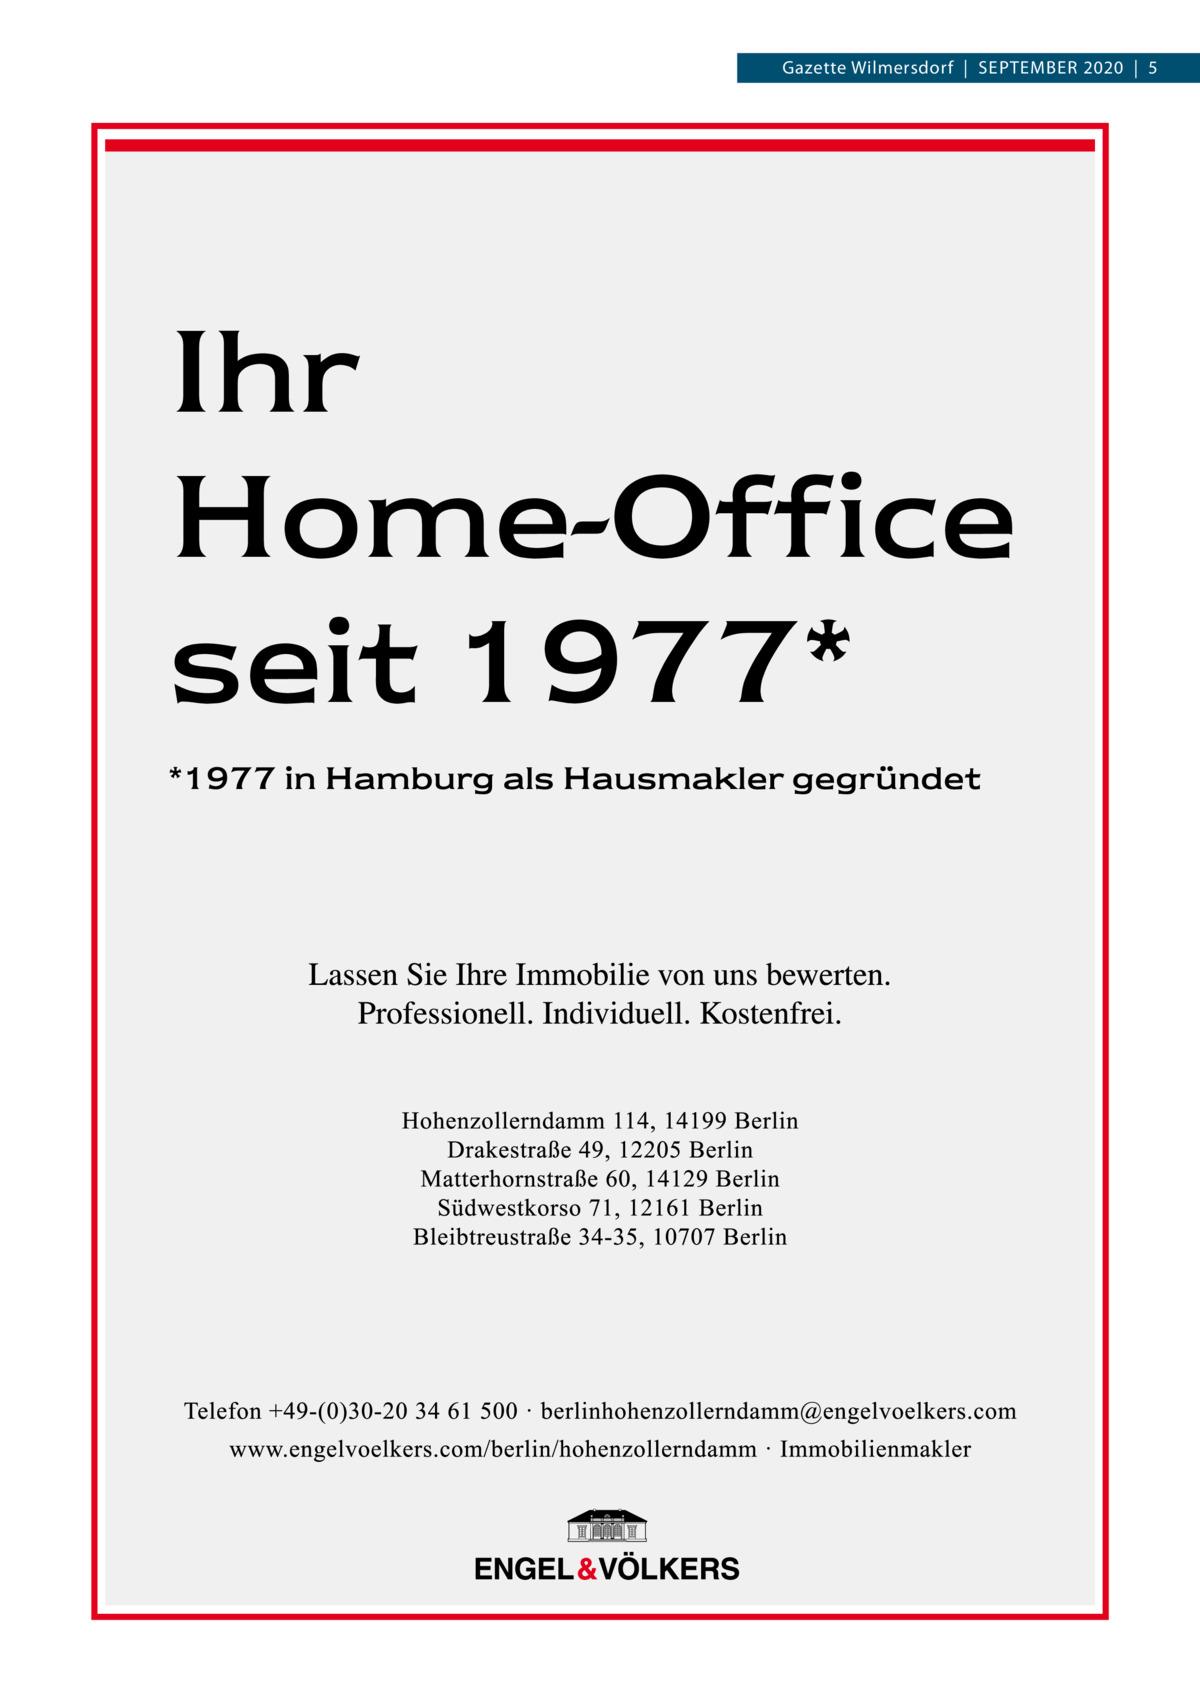 Gazette Wilmersdorf September 2020 5